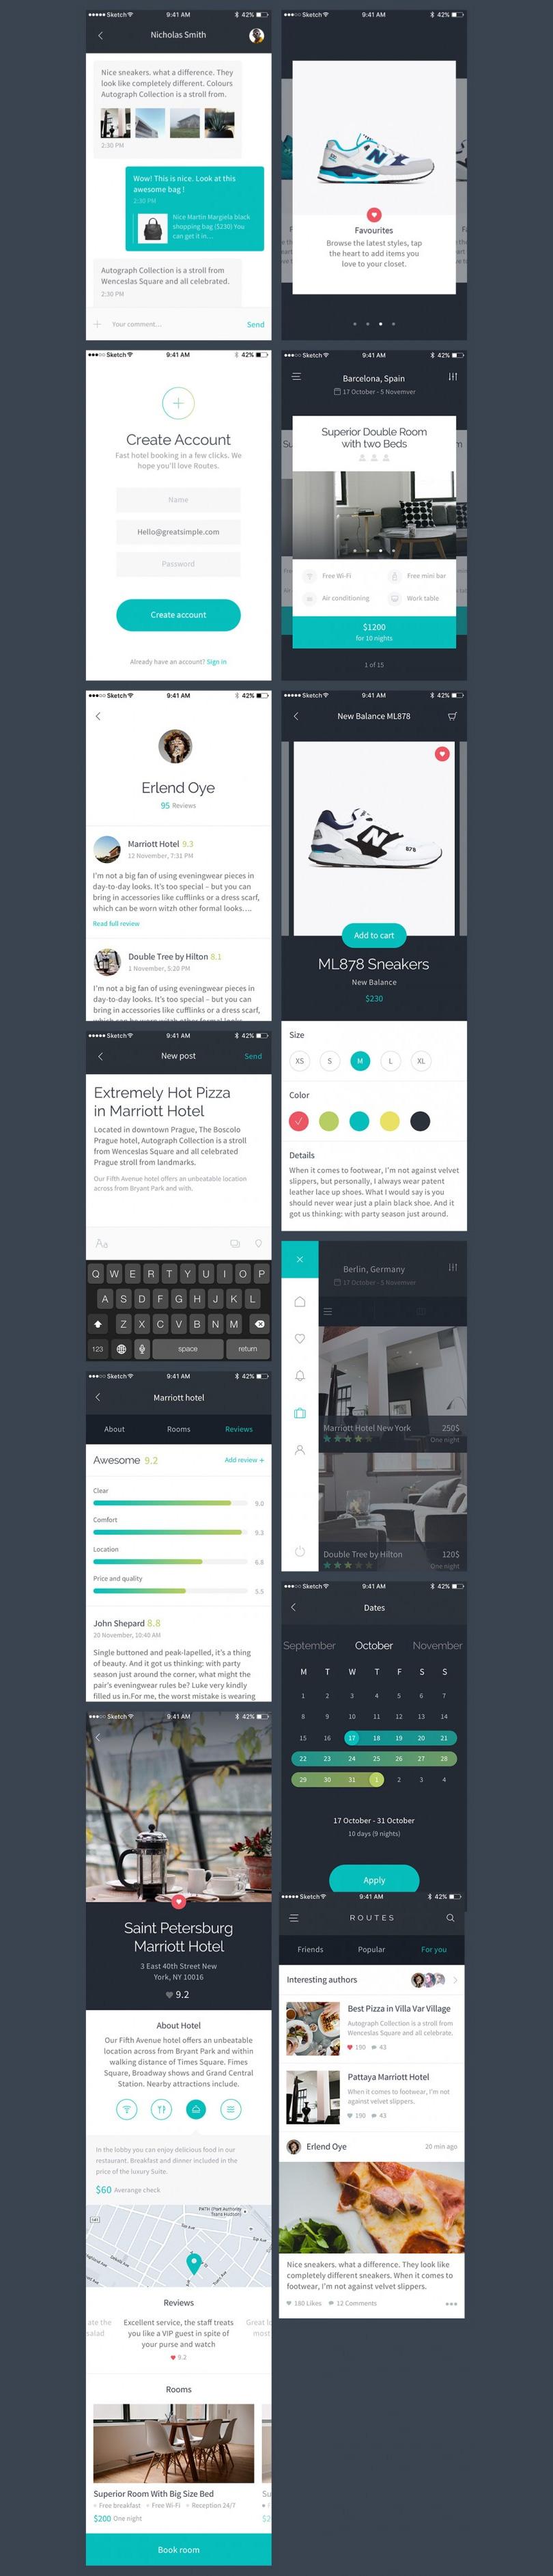 Шаблон iOS-приложения —Routes UI Kit